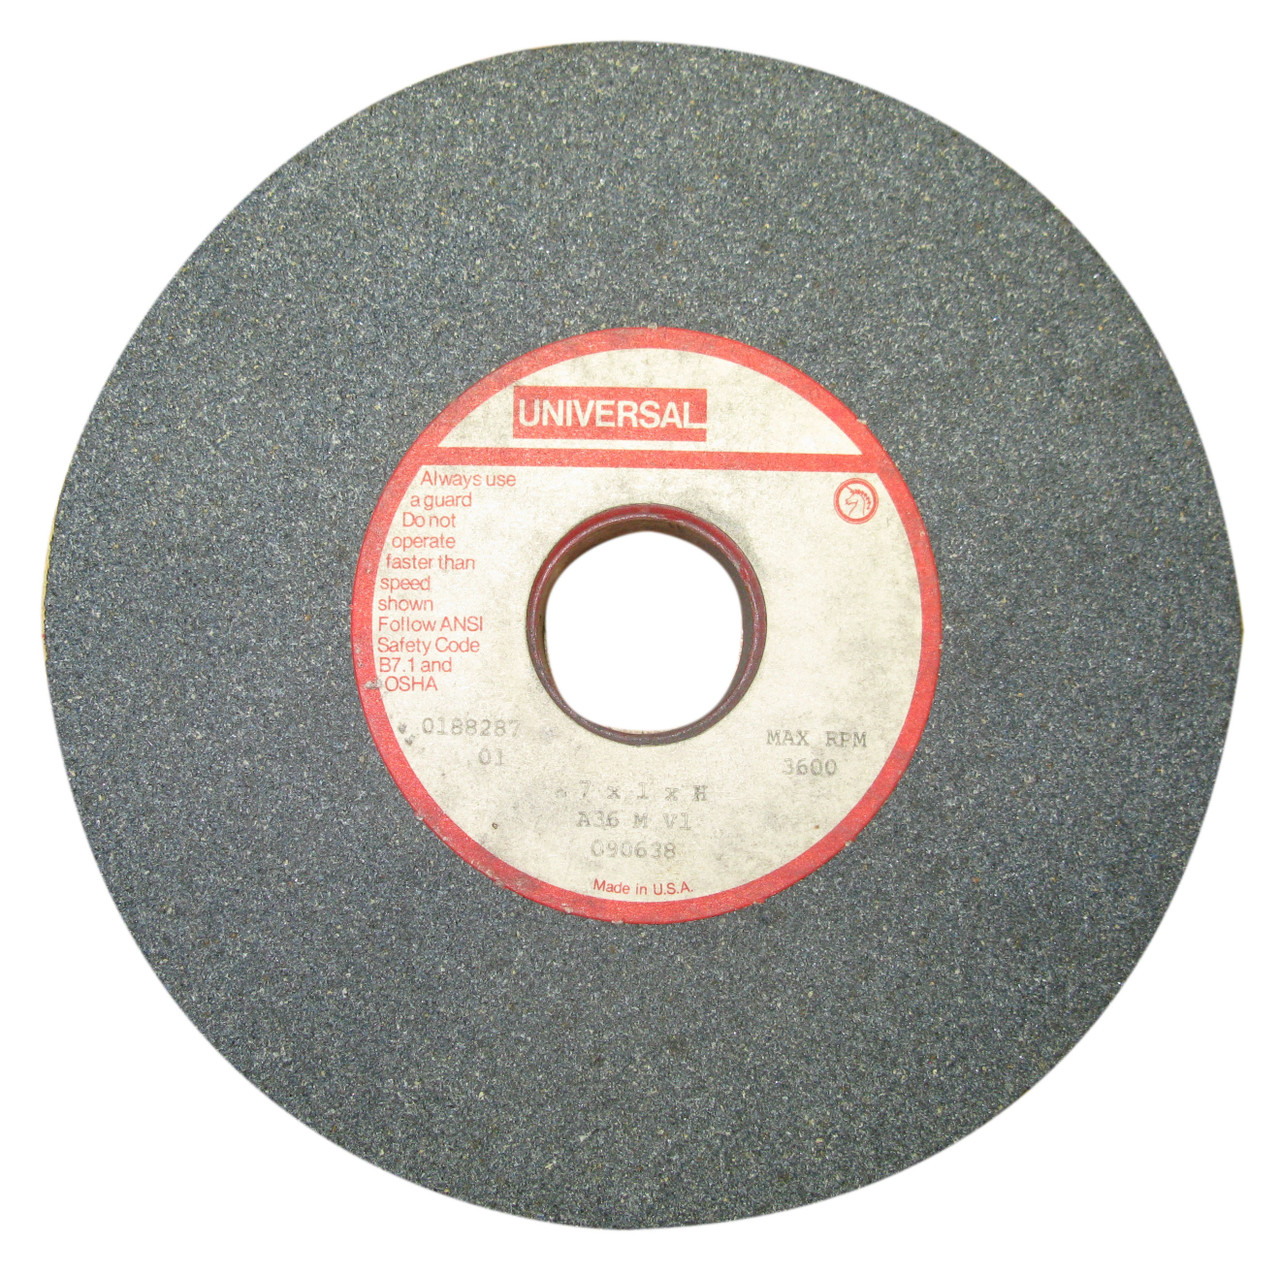 Universal #090638 General Purpose Grinding Wheel, 60 Grit, 7 x 1 x 1 1/4 Inch, NOS USA